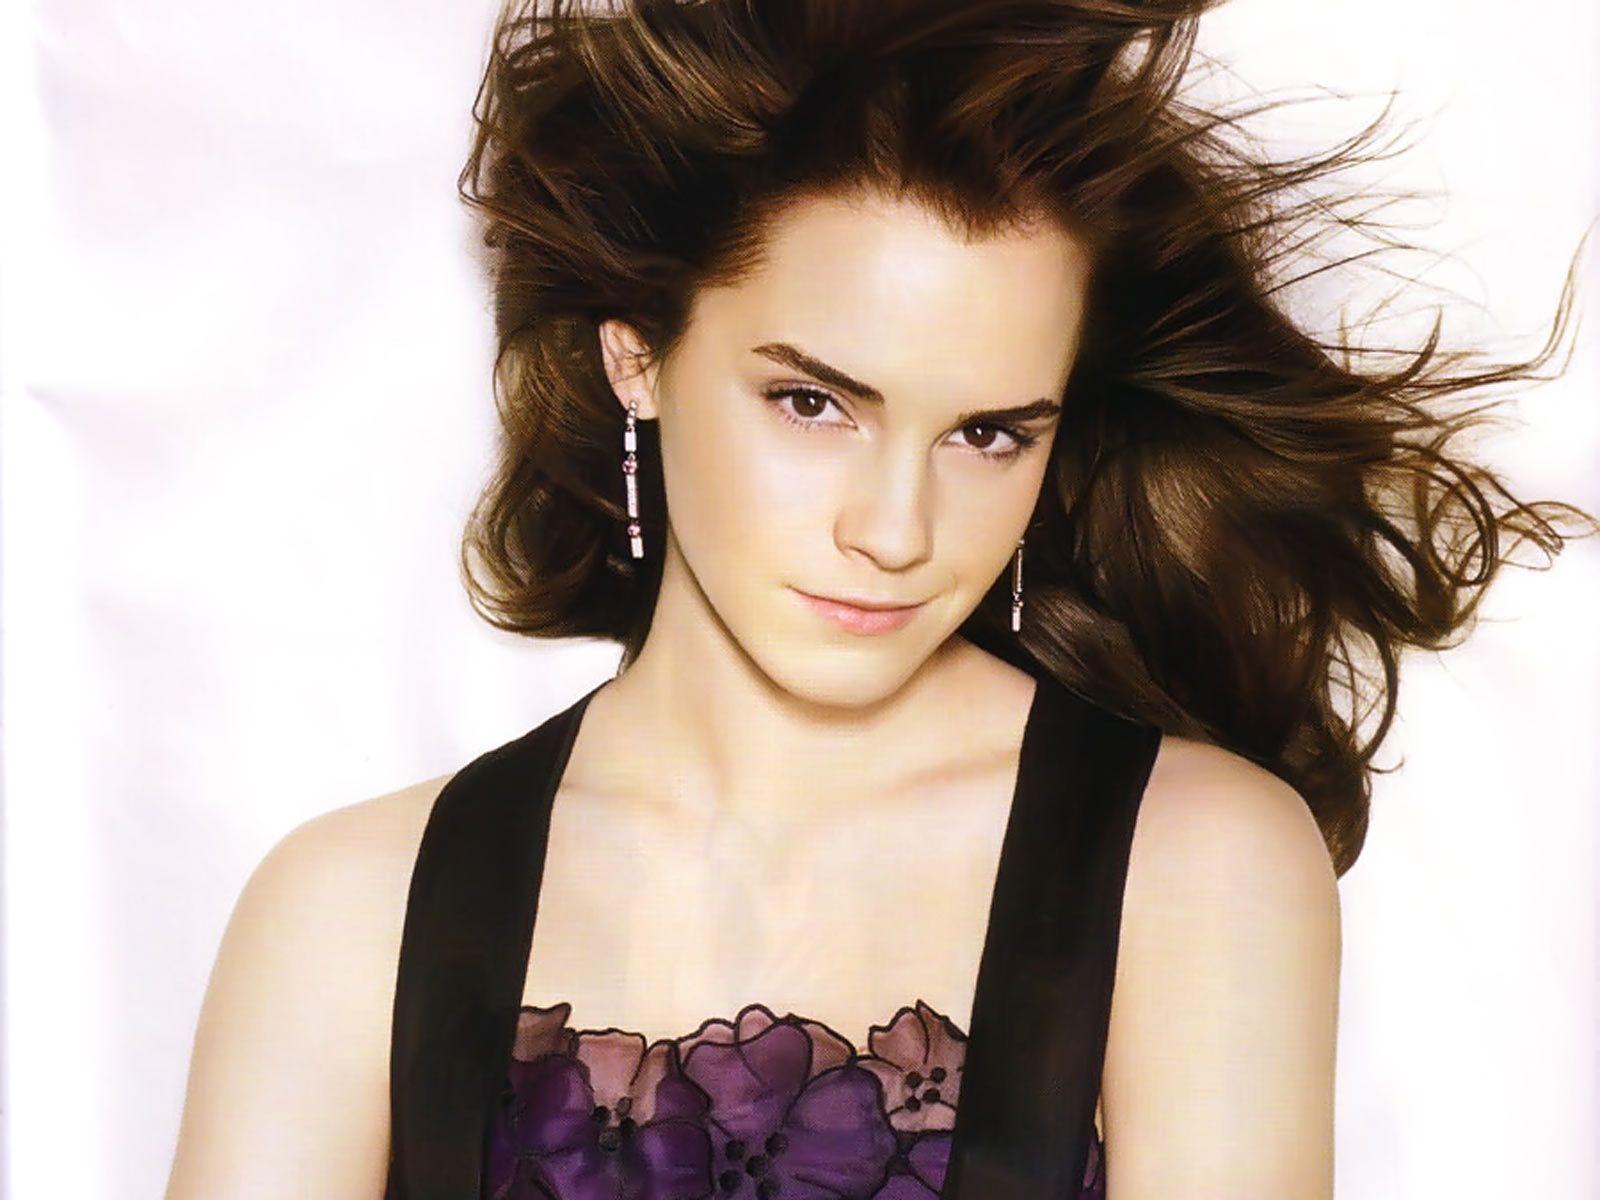 http://4.bp.blogspot.com/-7AQlKRo0IY0/Tt_Np2MSU-I/AAAAAAAADJ0/JHTAIKuceyc/s1600/Girl+Hairstyle%252C+Photo+Gallery%252C+Emma+Watson+Hairstyles%252C+Celebrity+Emma+Watson+Hairstyles%252C+Emma+Watson+Hairstyles+Photo%252C+Latest+Emma+Watson+Hairstyles%252C+Emma+Watson+Hairstyles+Cutting+%252845%2529.jpg